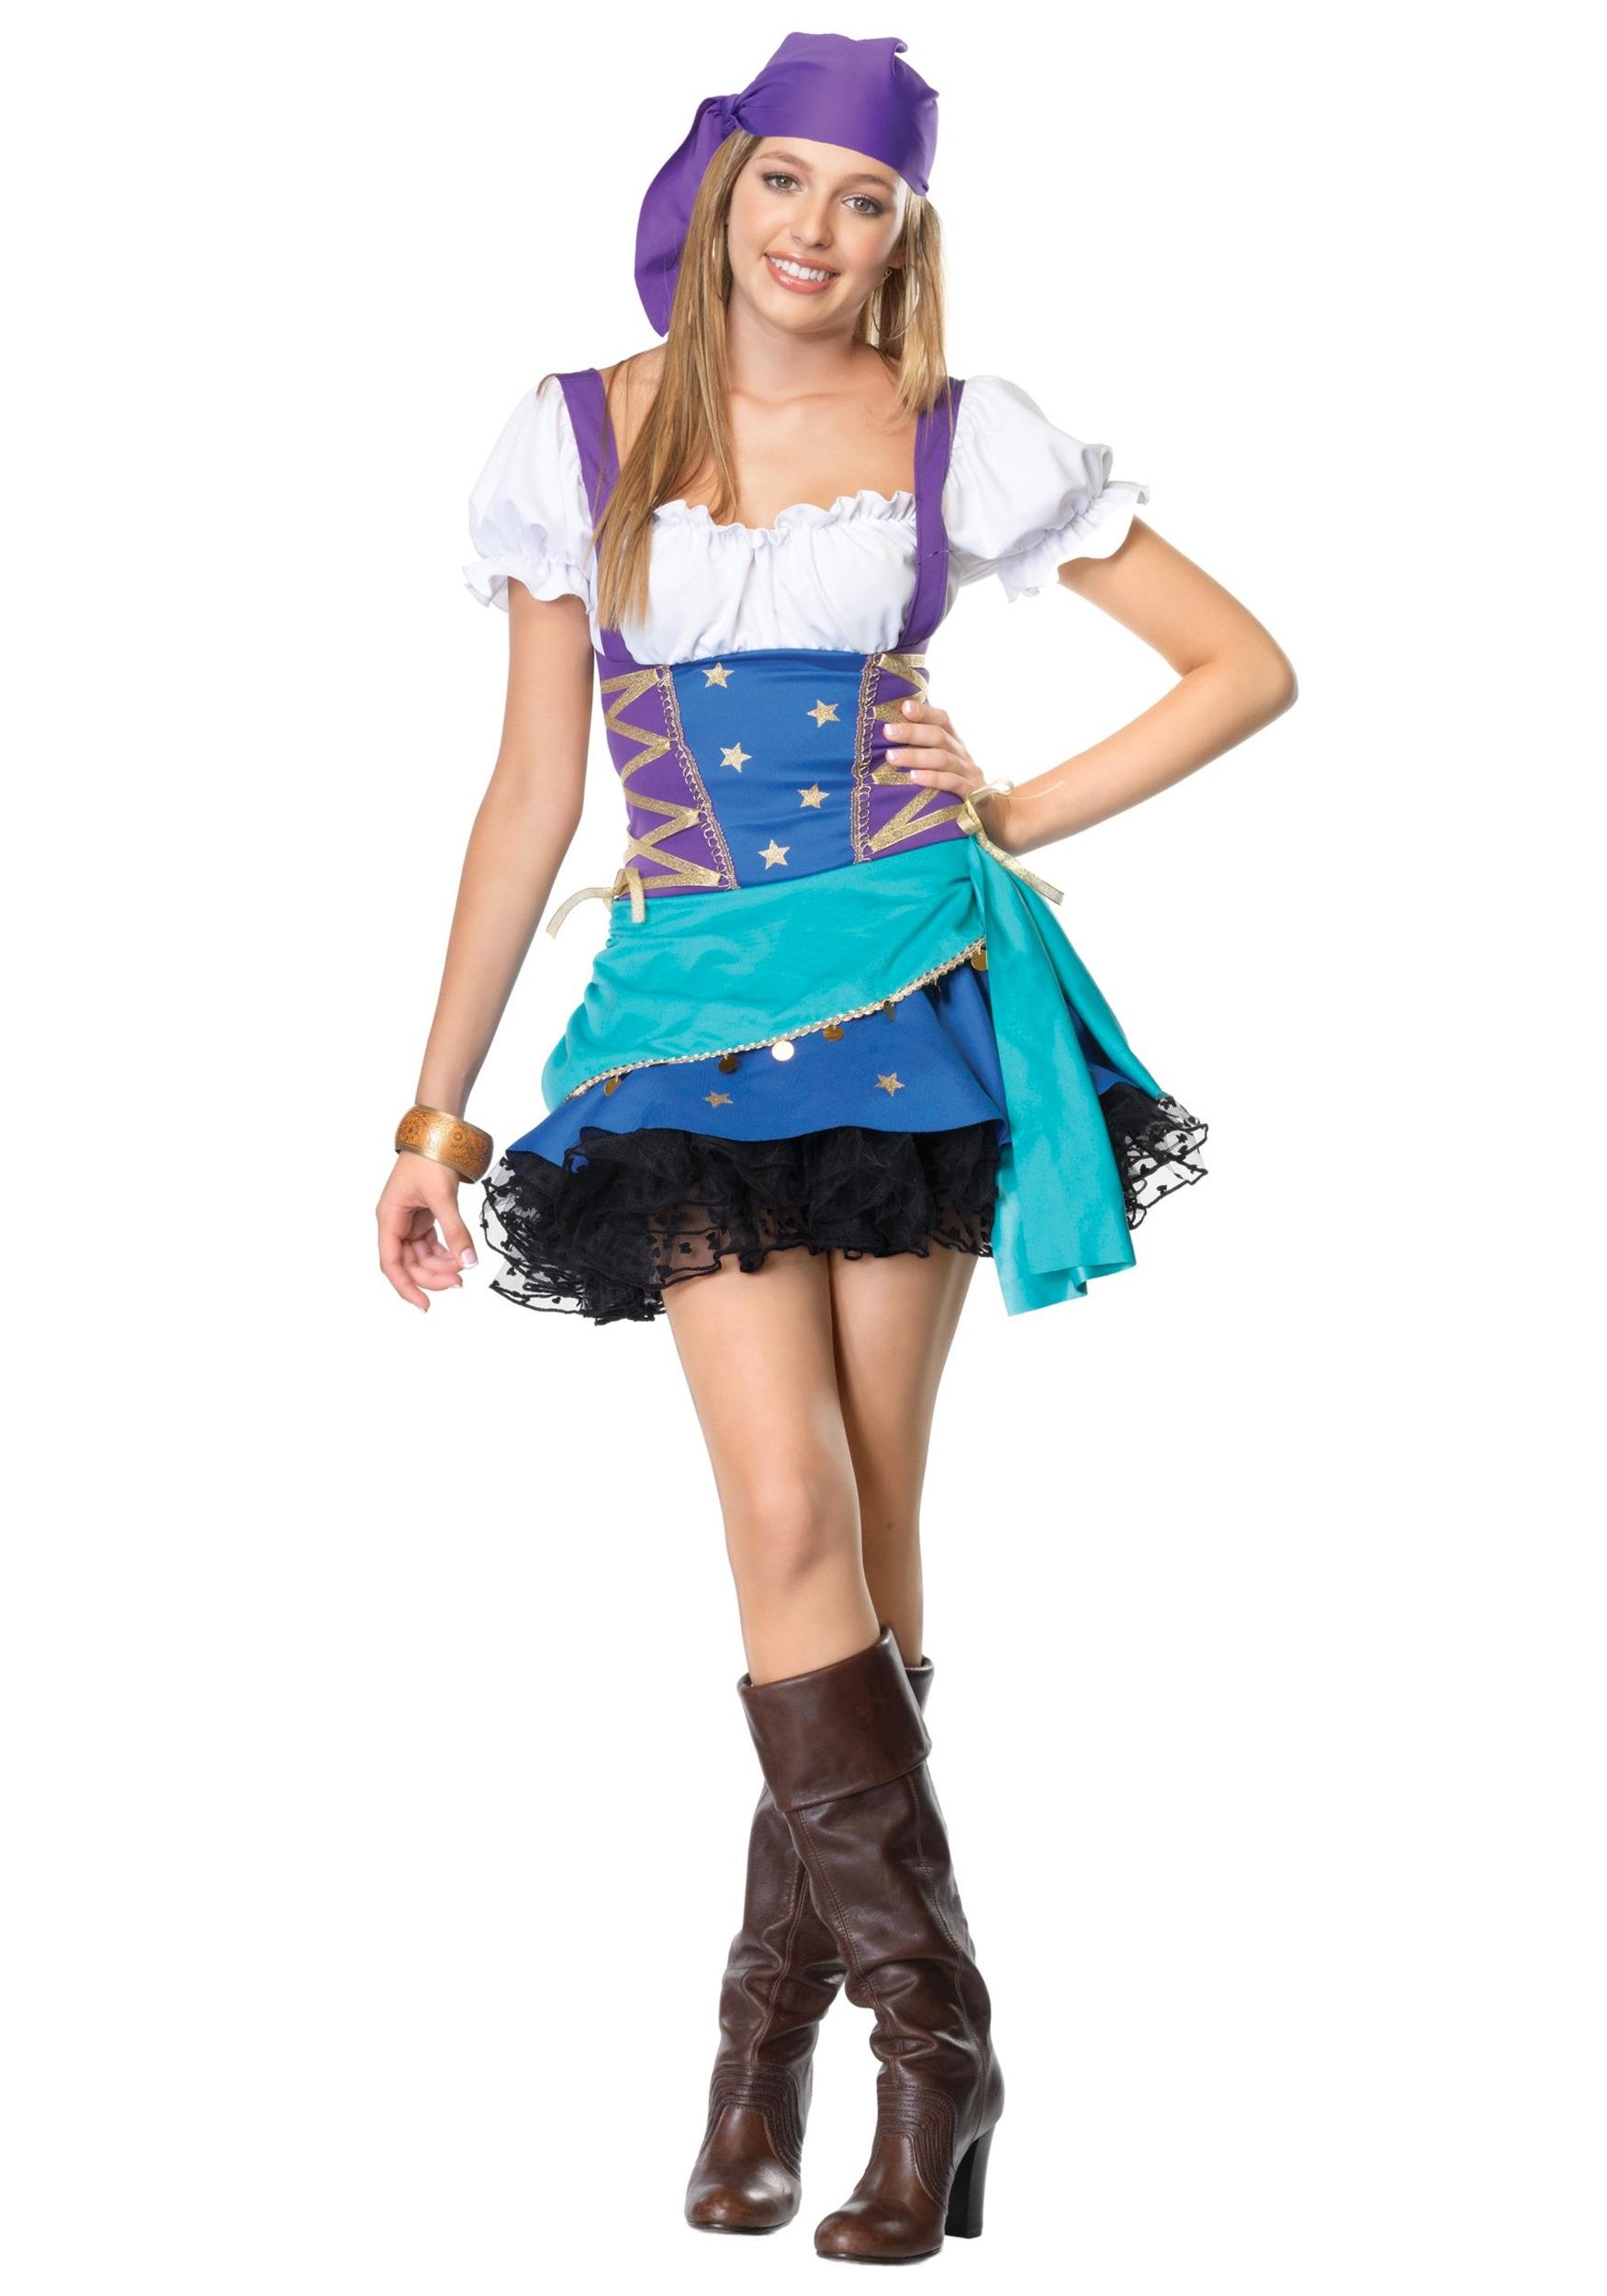 Pin on Costumes |Diy Esmeralda Costume